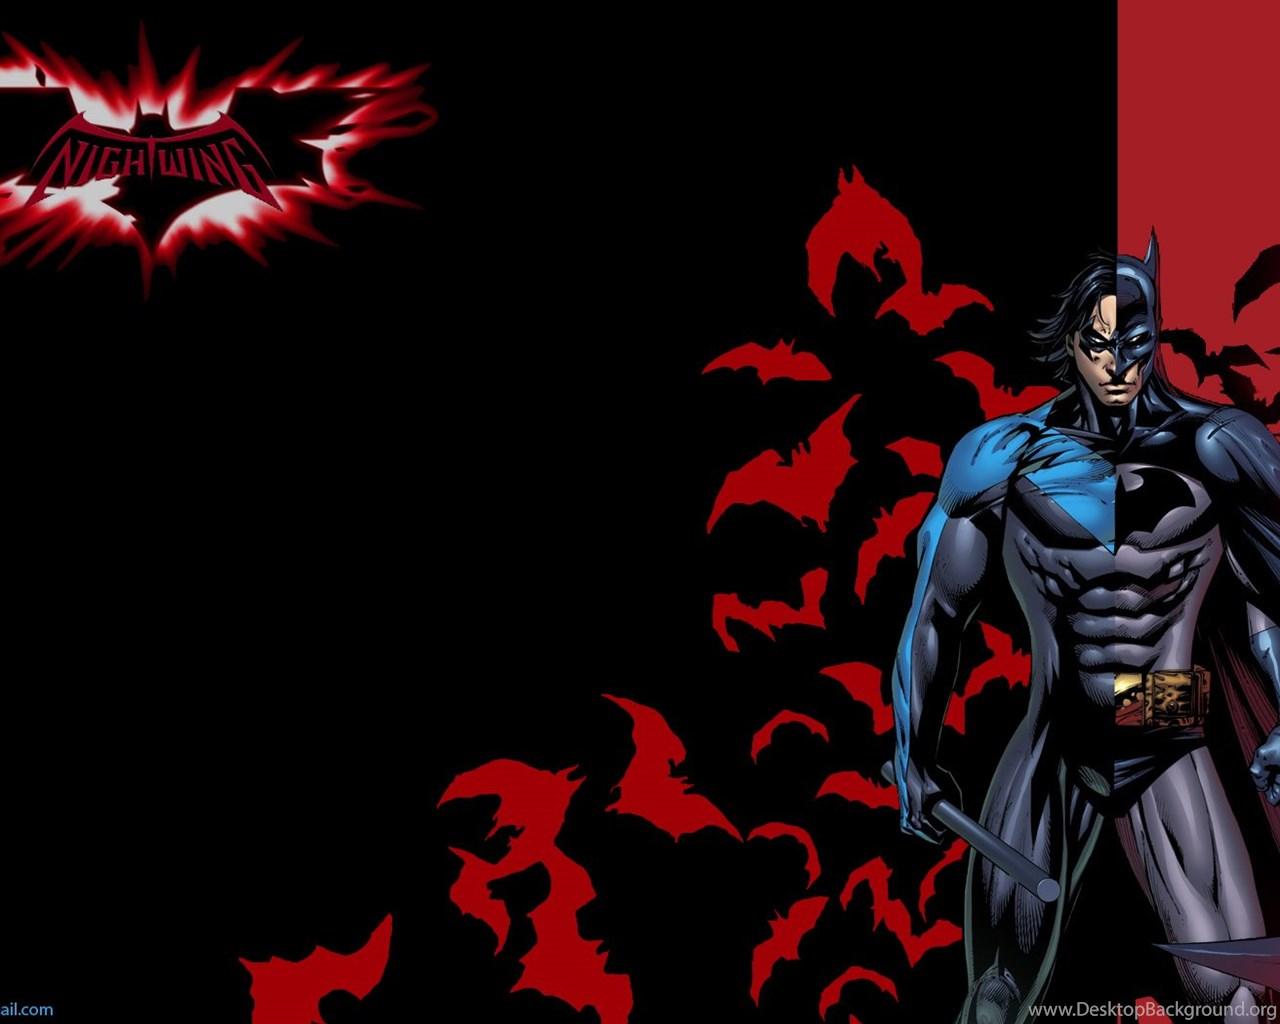 Nightwing Wallpapers Hd Desktop Background